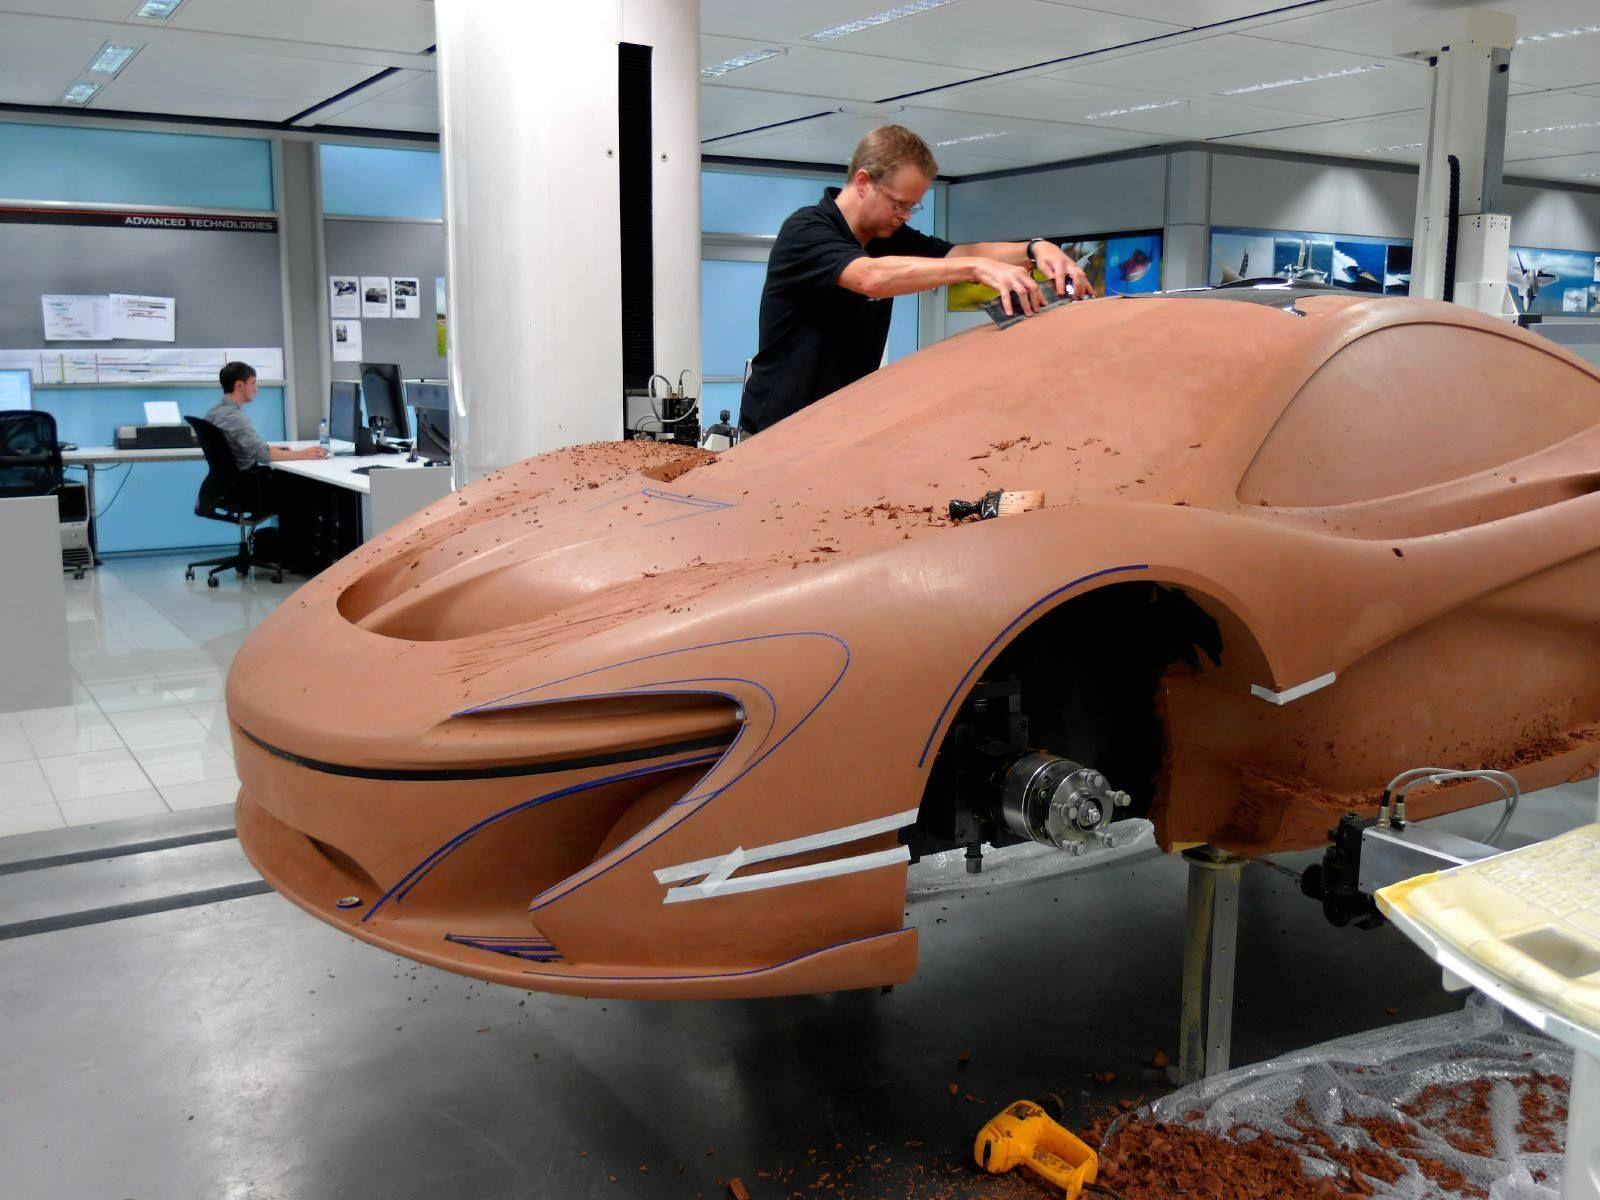 Design of car model - Mclaren P1 Clay Model